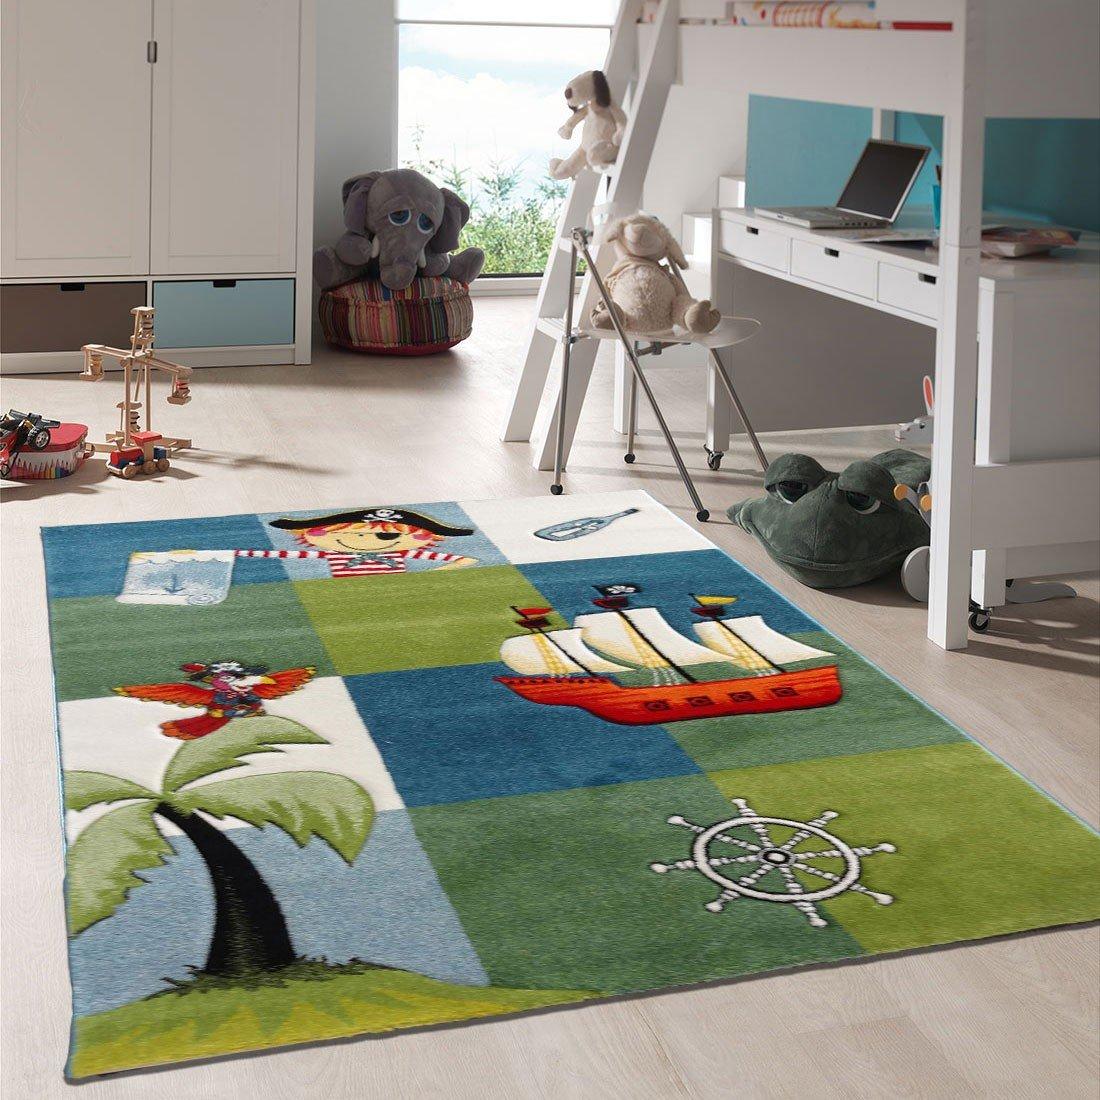 DEZENCO Tapis Chambre Smart Pirate Bleu 60 x 110 cm Tapis Enfant et Disney